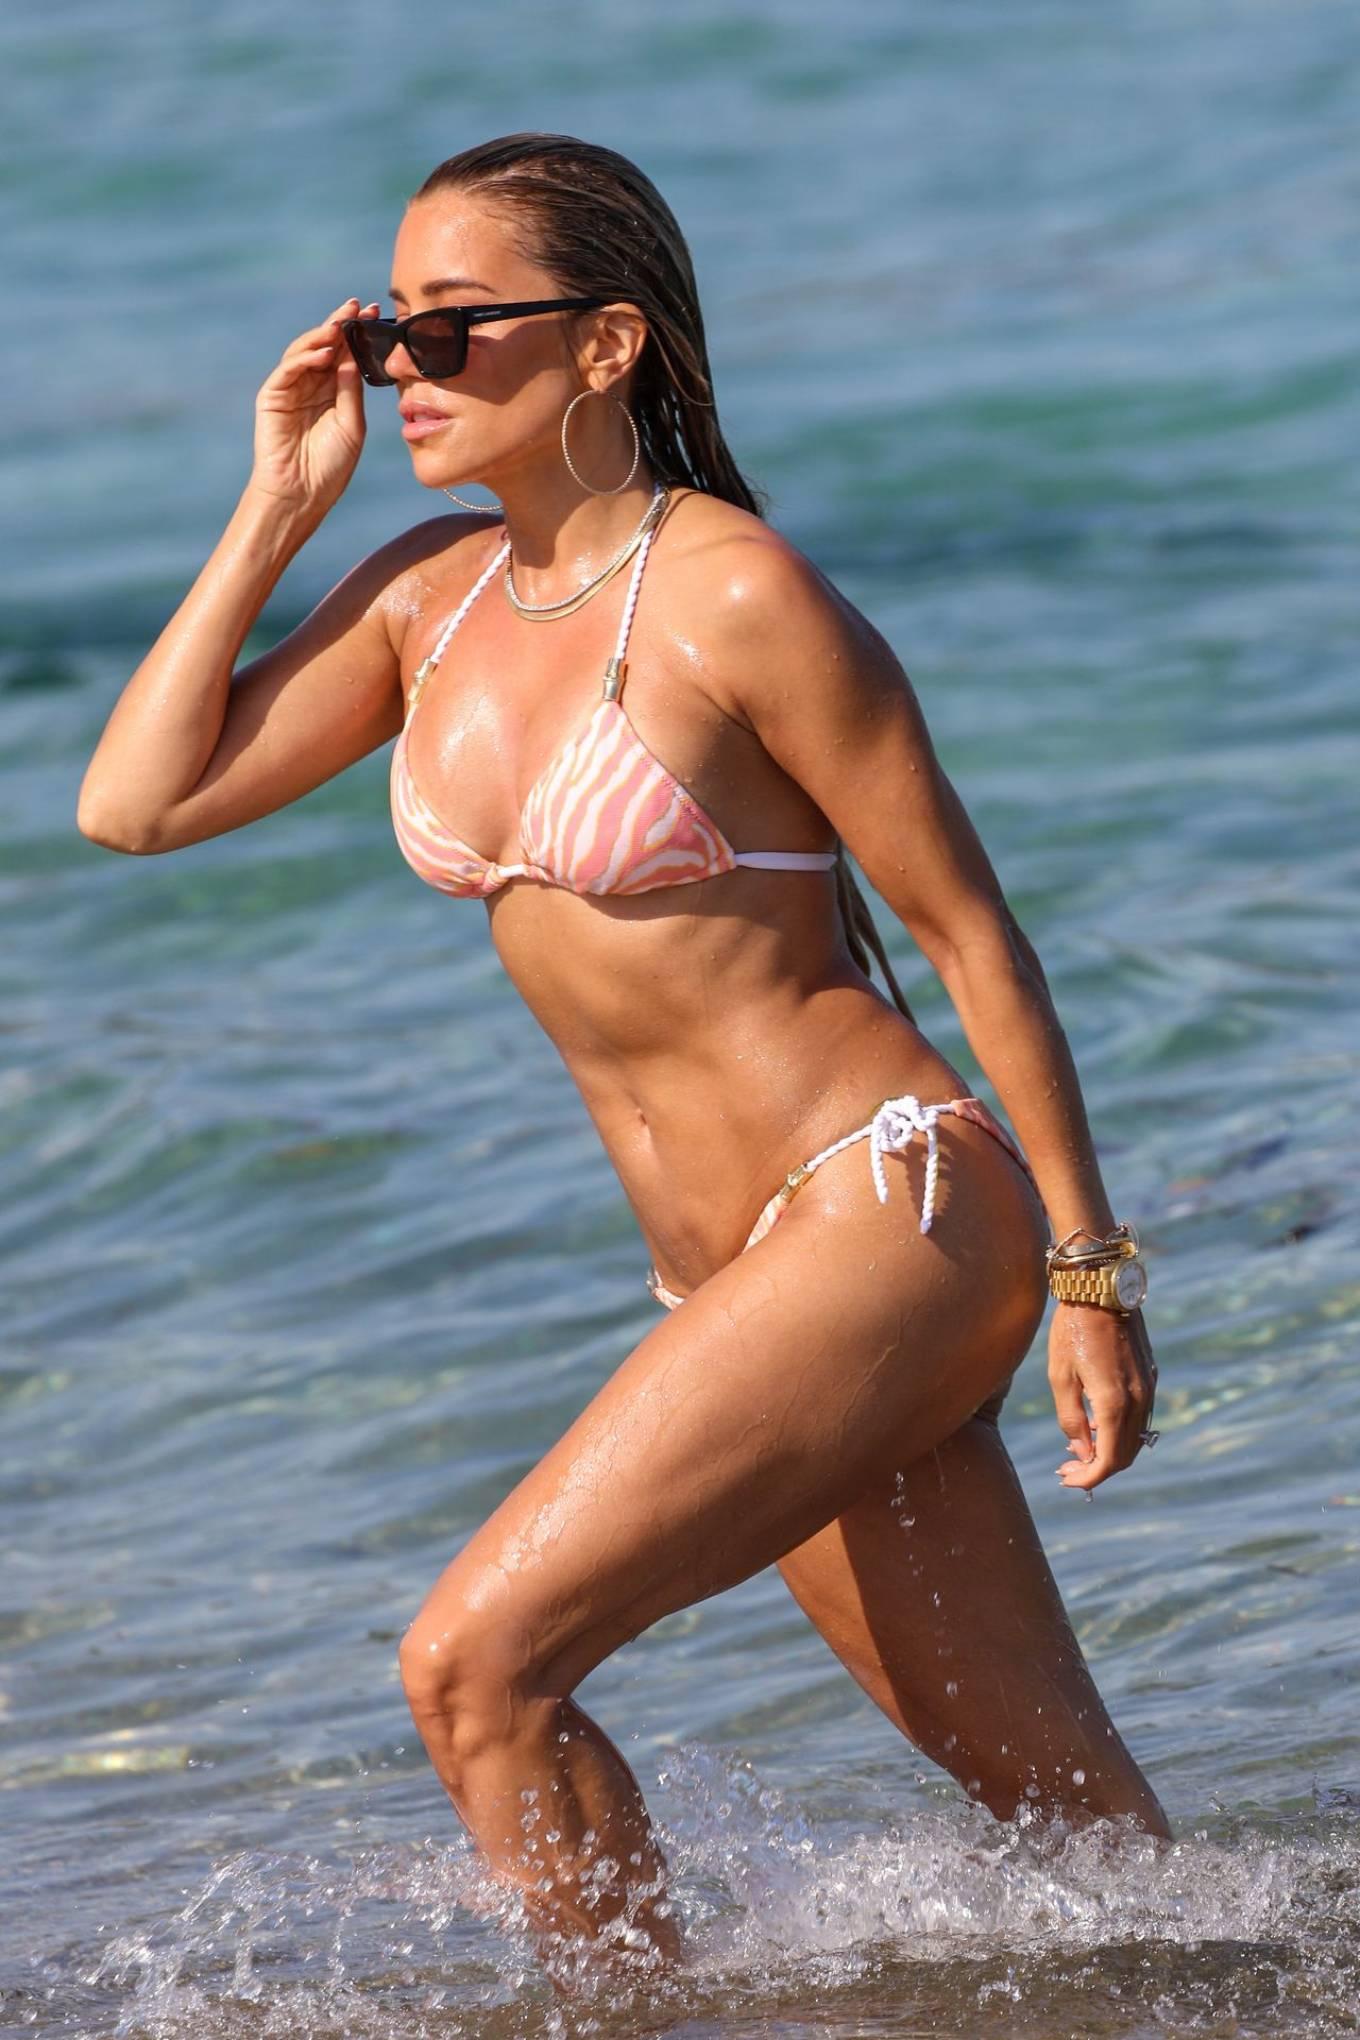 Sylvie Meis 2020 : Sylvie Meis in Bikini 2020-22